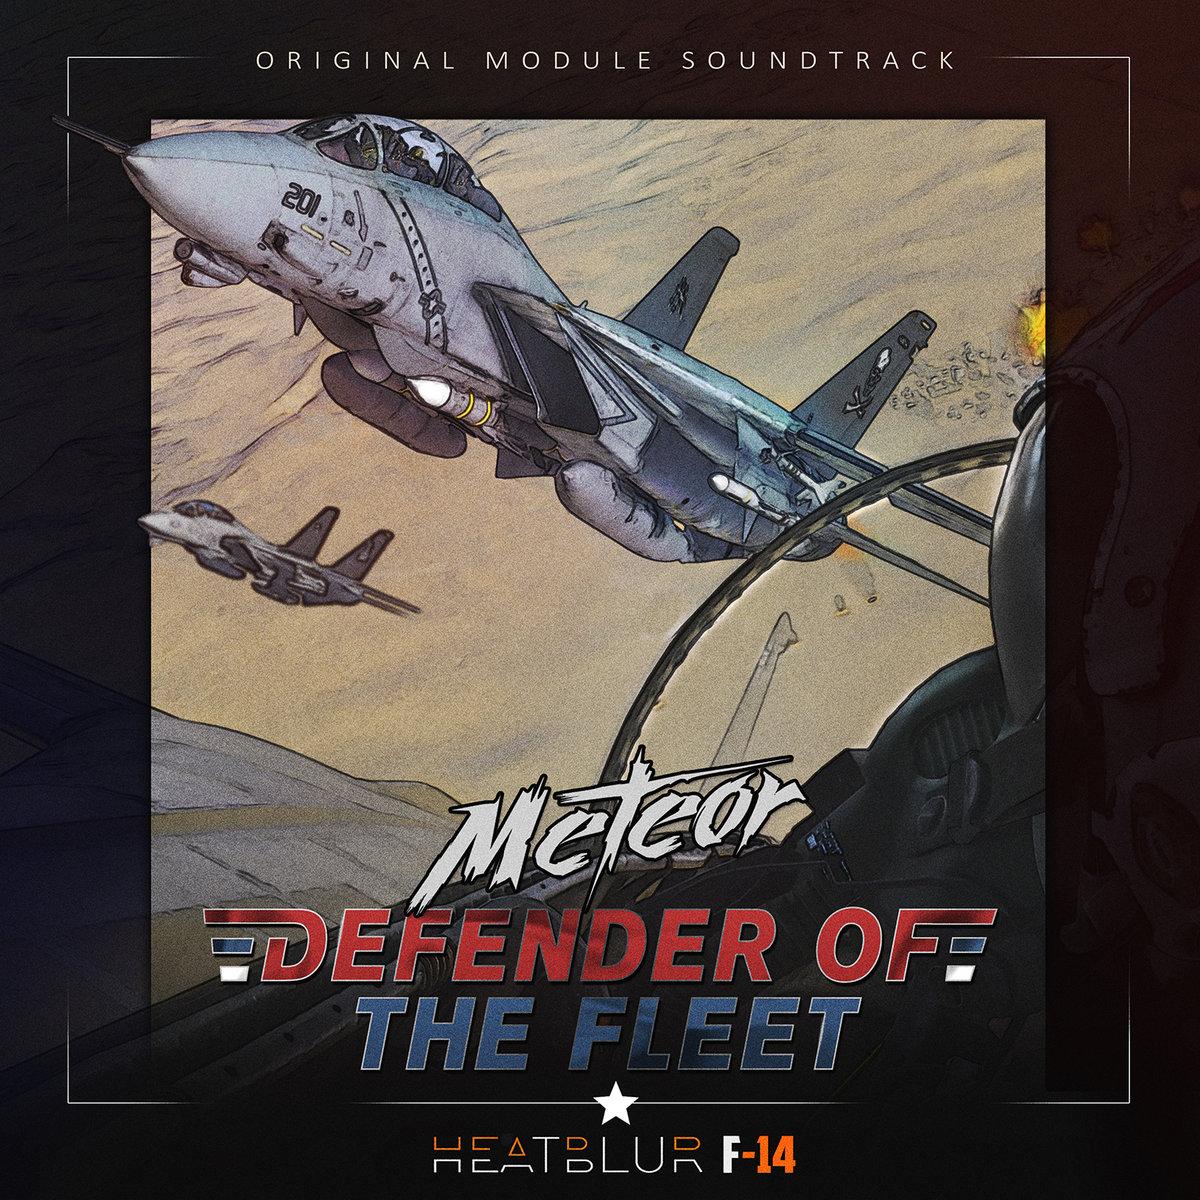 Defender of the Fleet (Heatblur F-14 Original Soundtrack